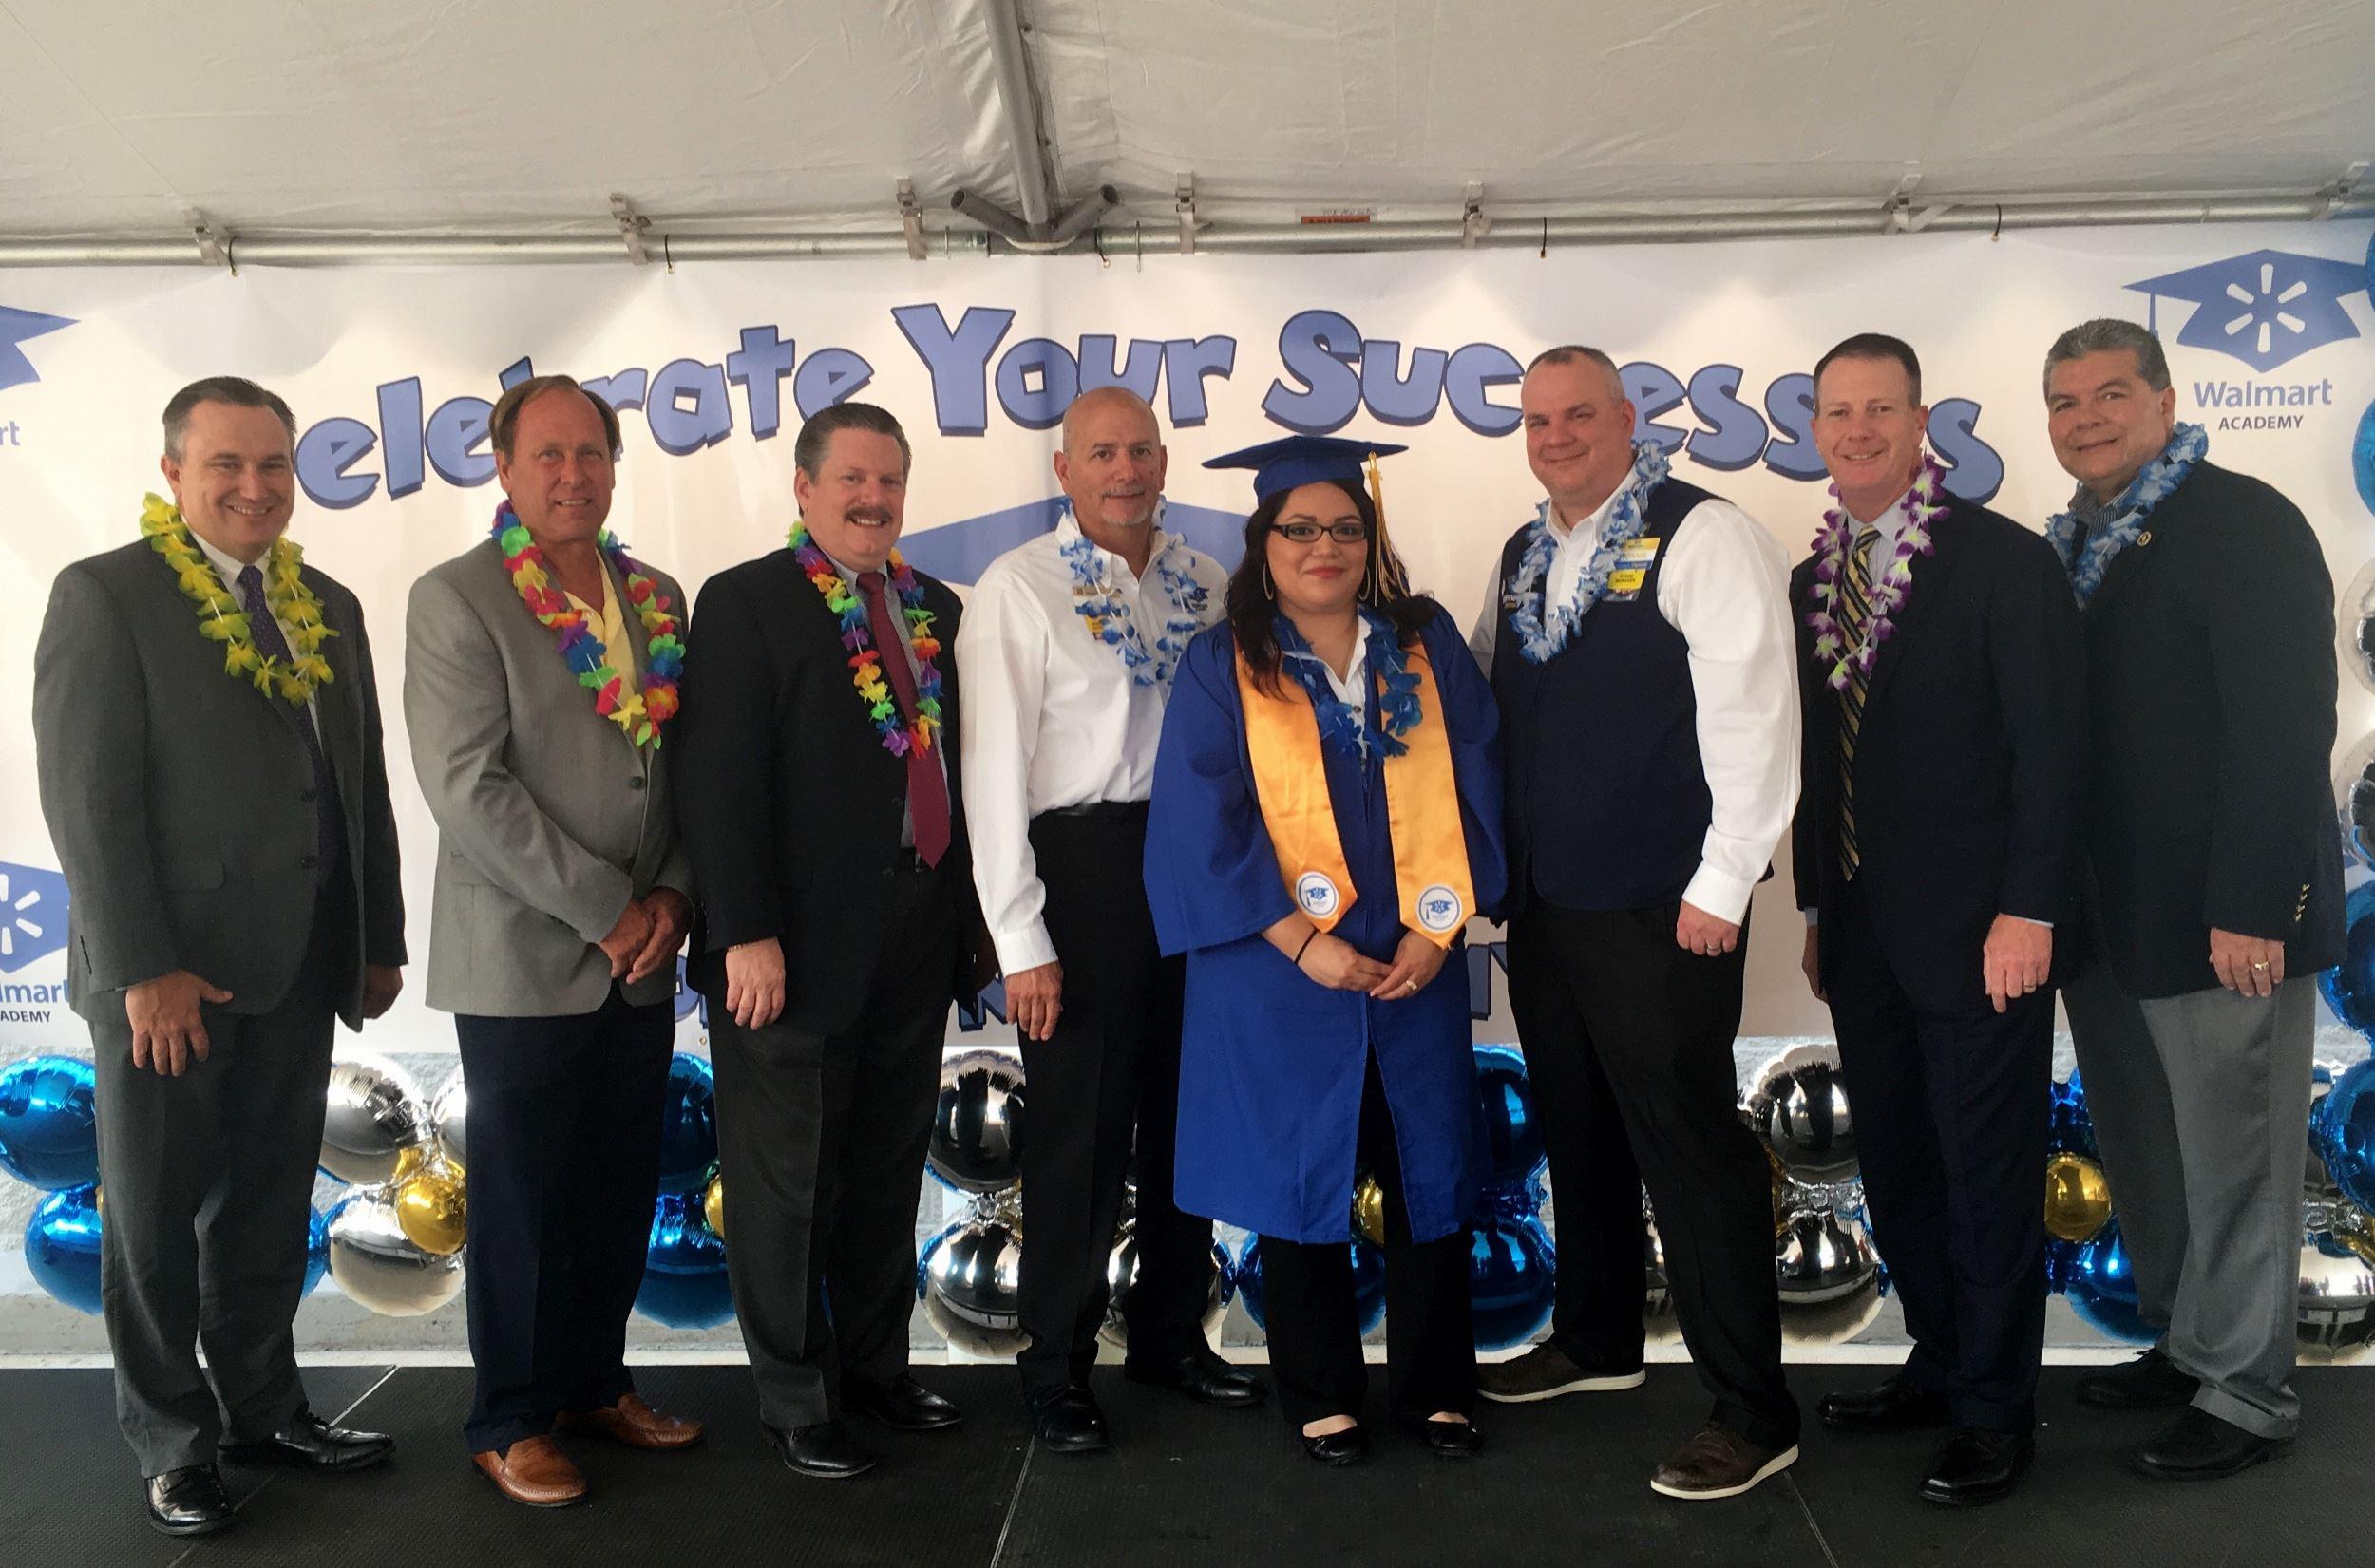 Mesquite Walmart Divisional Academy Graduates First Class